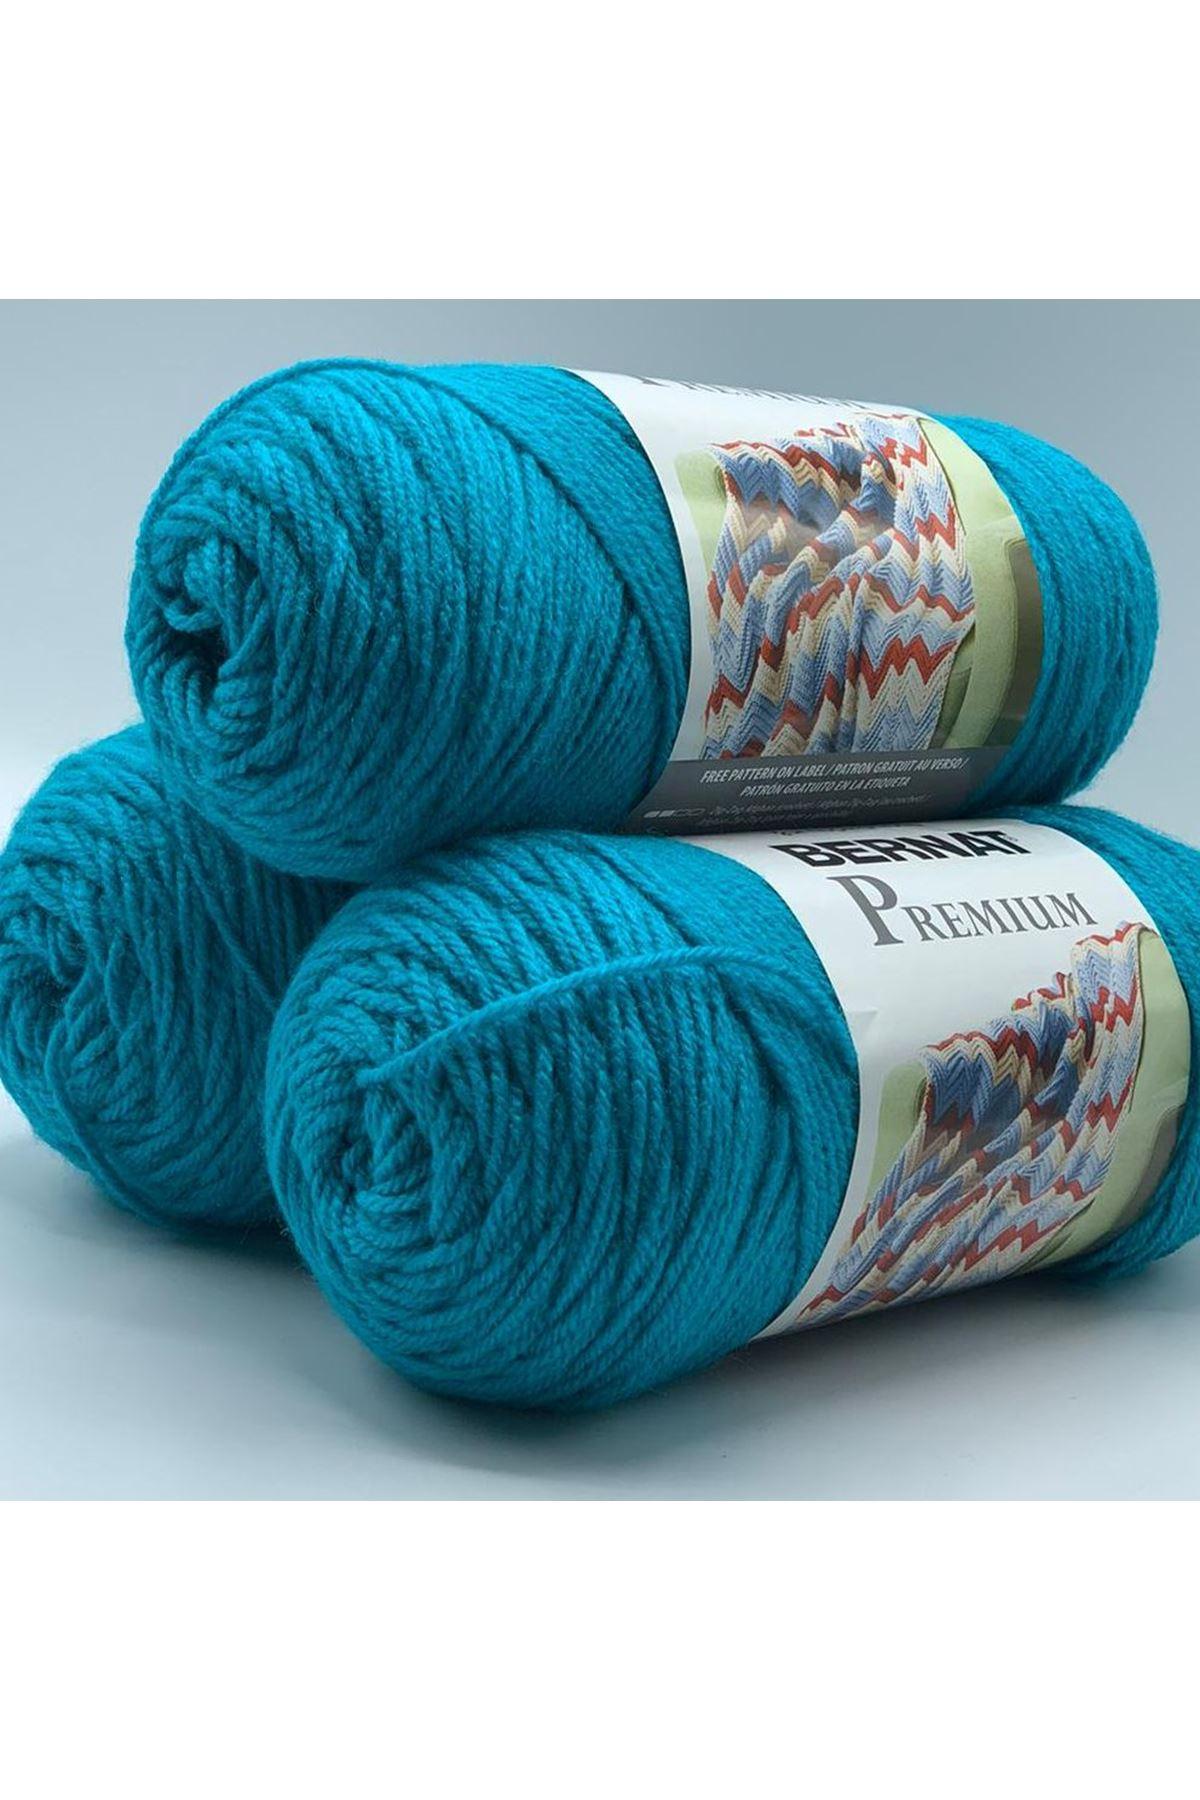 3'lü Paket Orijinal Bernat Premium Akrilik 600 gram 1142 Mavi